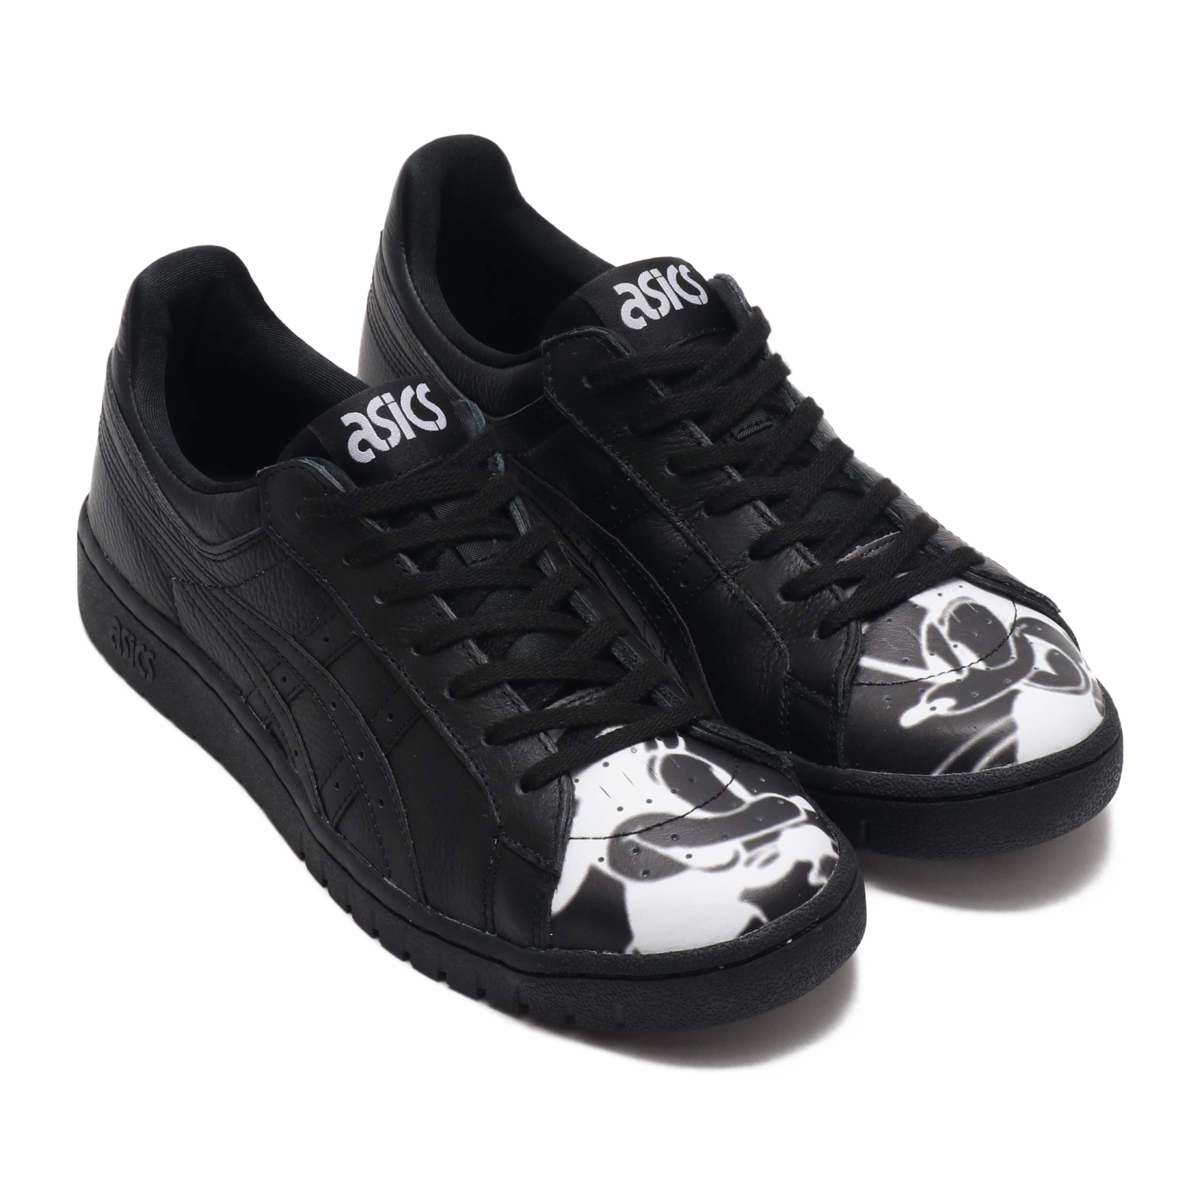 asics Tiger GEL-PTG Disney(アシックス タイガー ゲル PTG ディズニー)BLACK/BLACK【メンズ レディース スニーカー】18HO-I